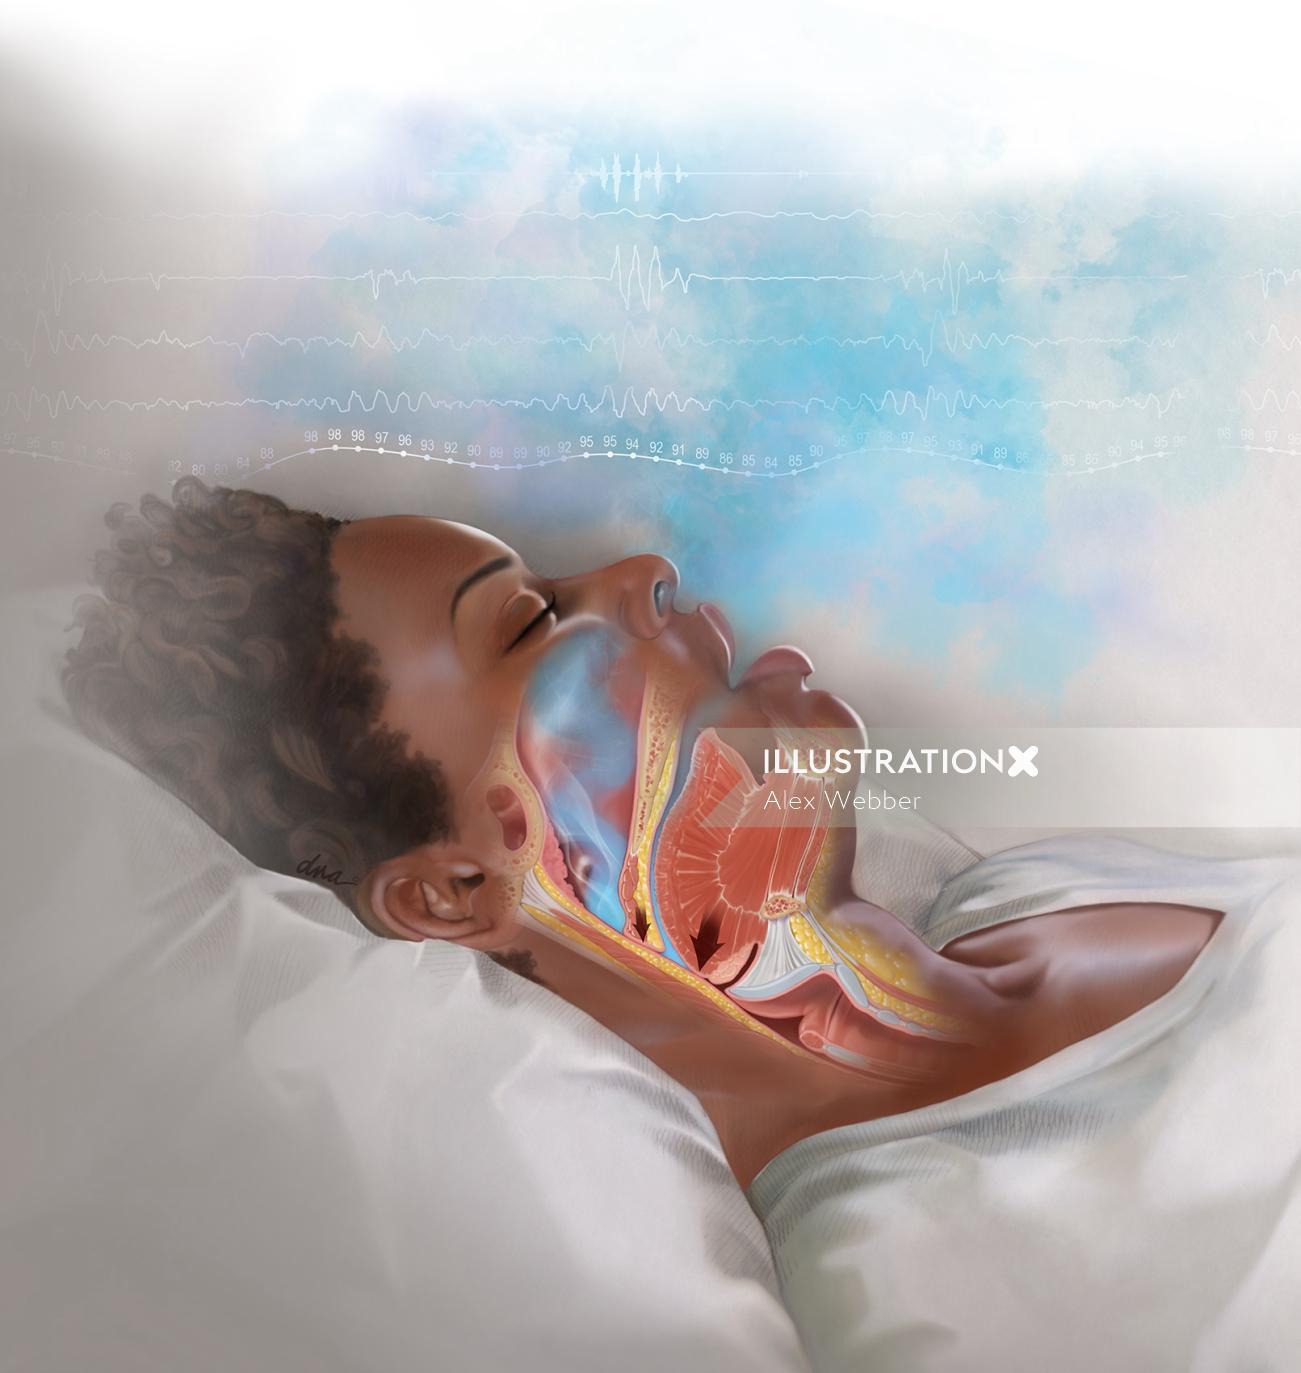 Obstructive Sleep Apnea Medical illustration